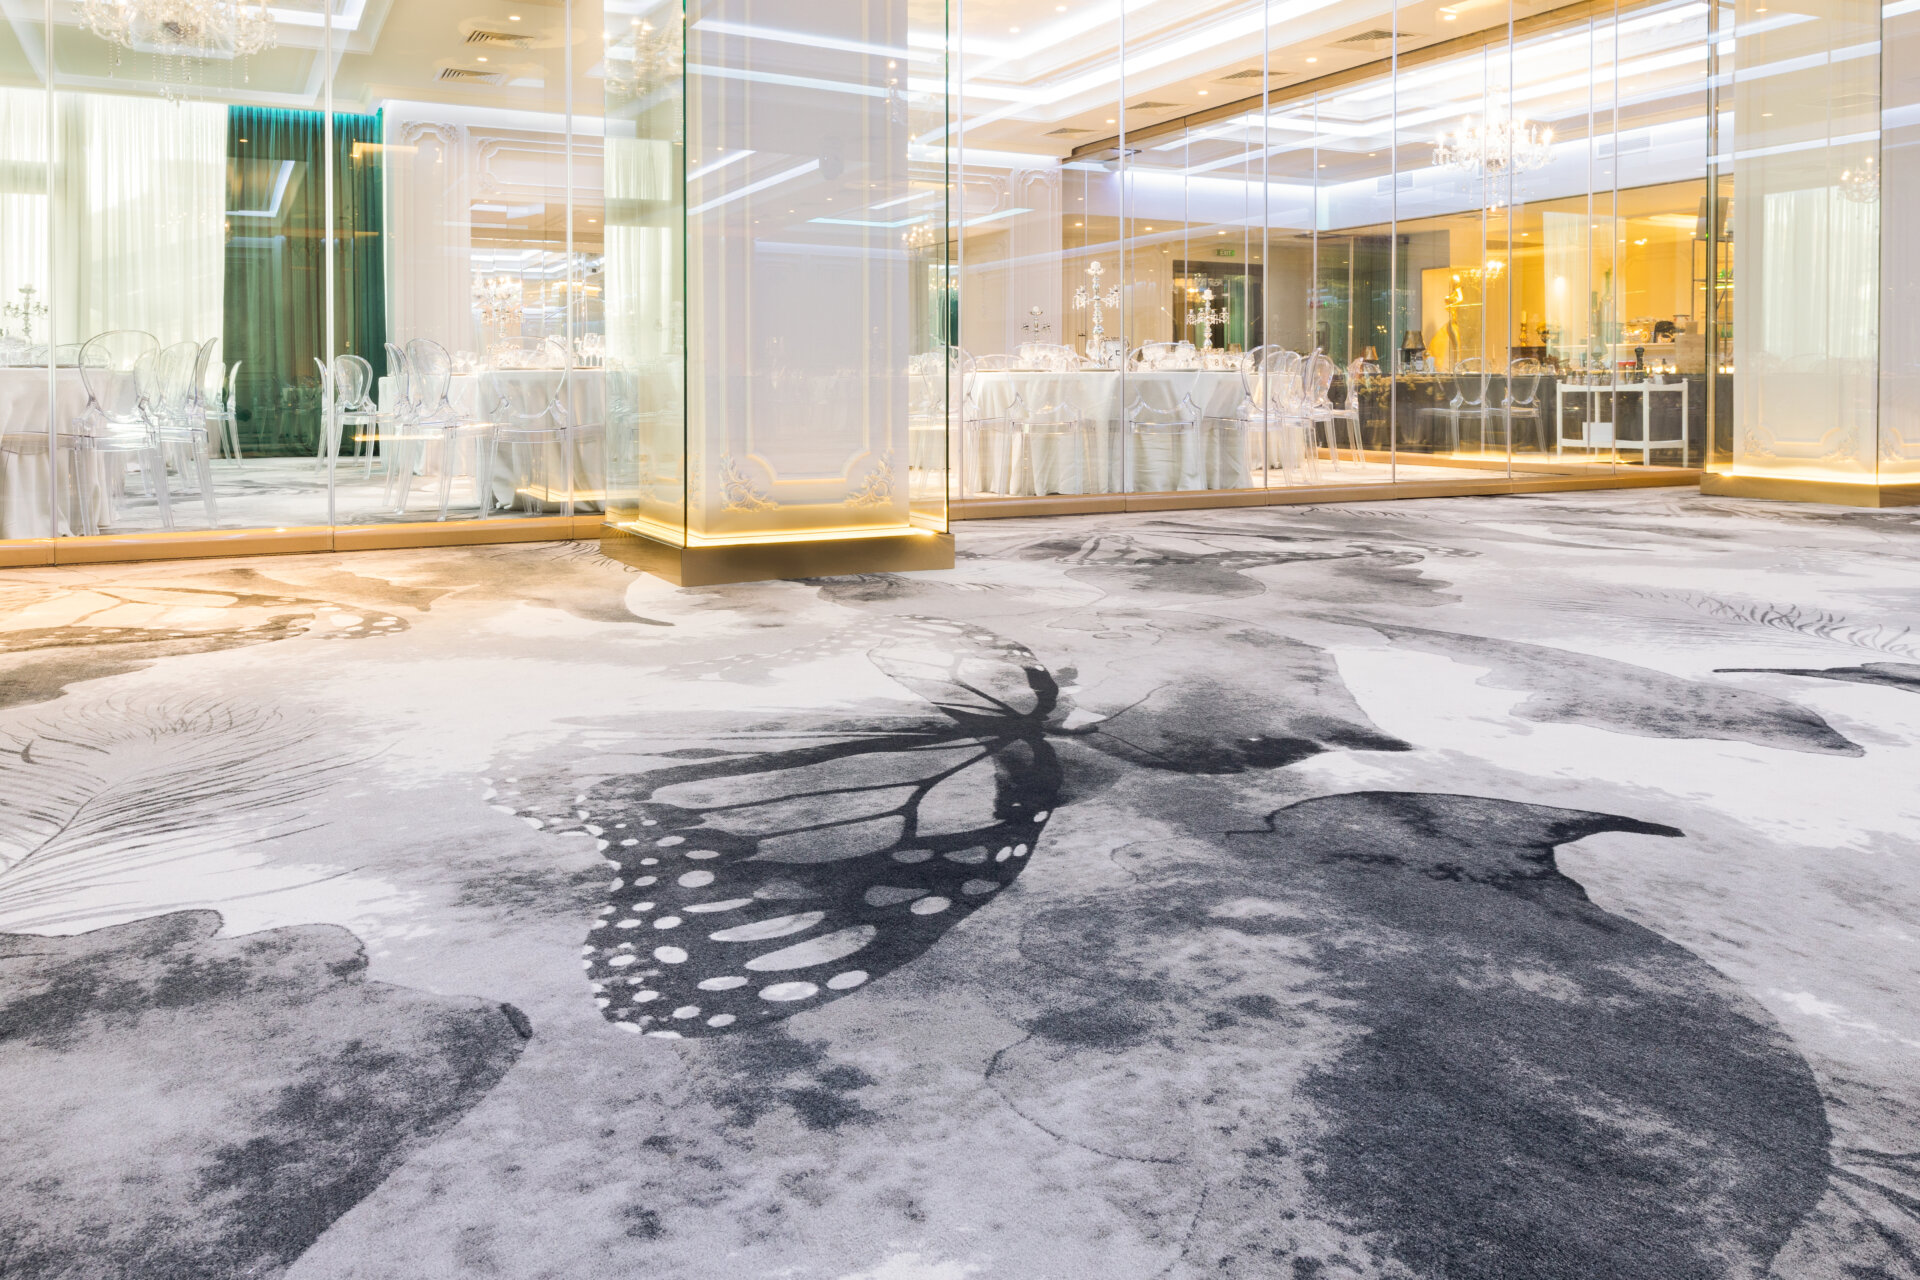 20210303-carpet&more-hotel-rocca-craiovaby-hugmedia-16